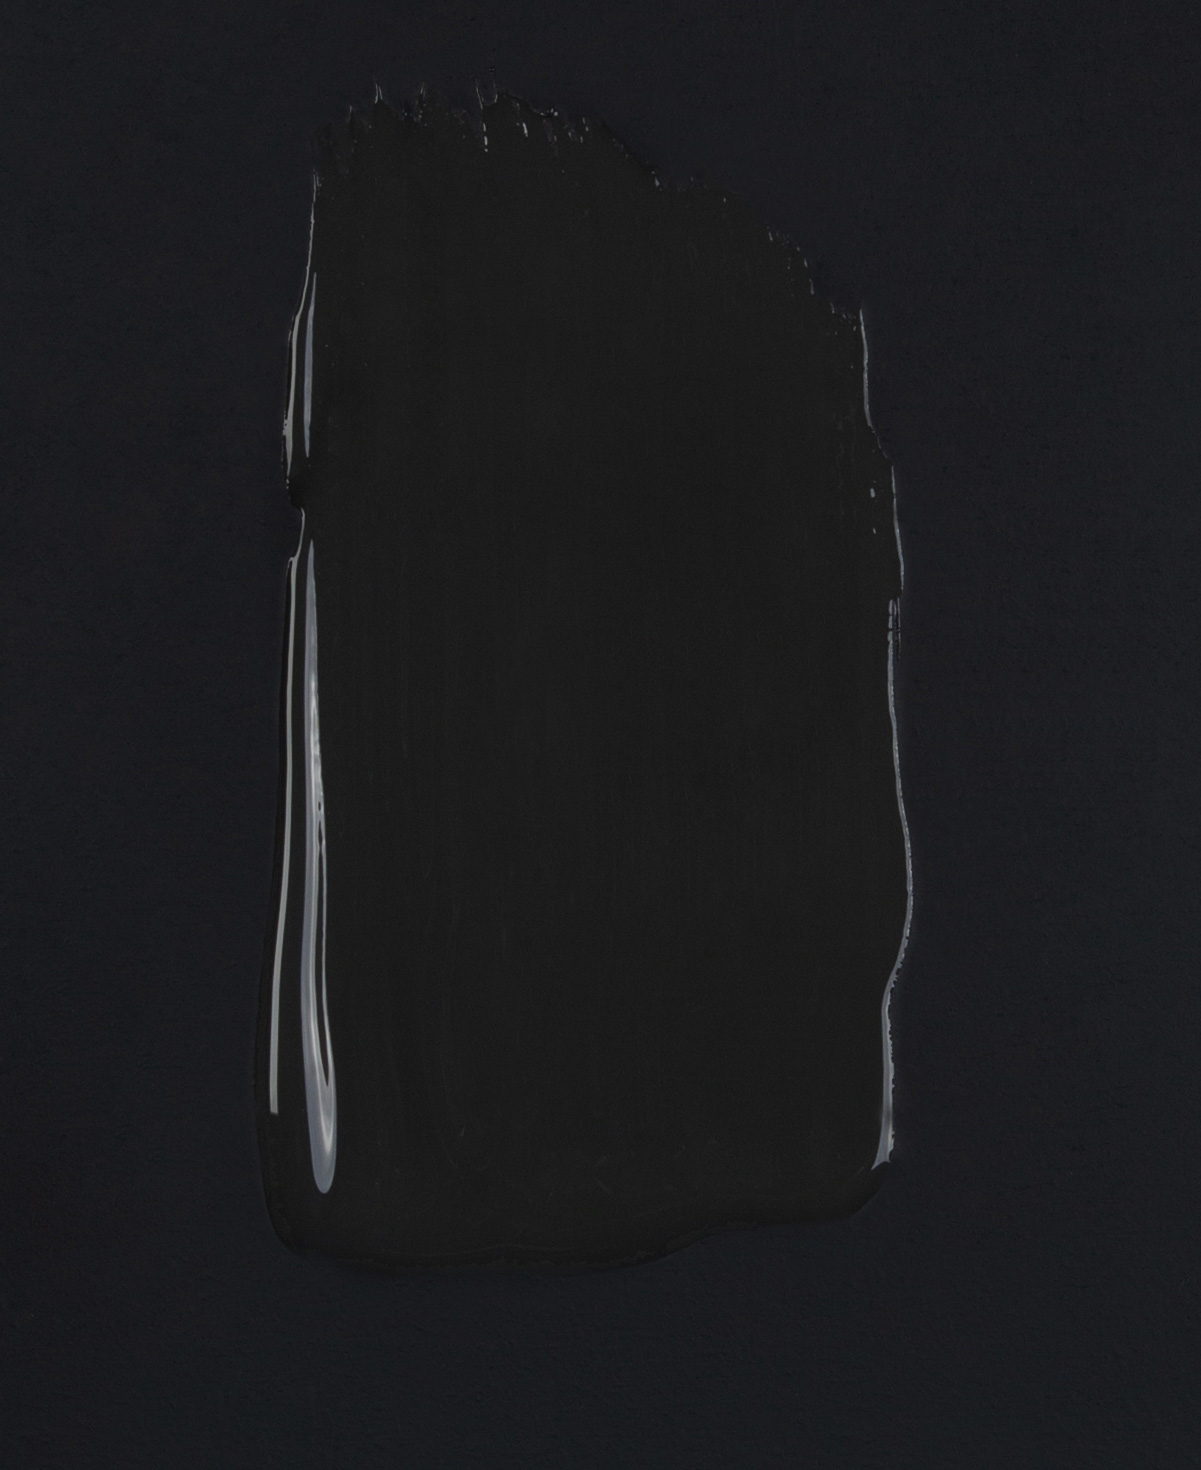 All the lights off dark grey paint swatch on dark background